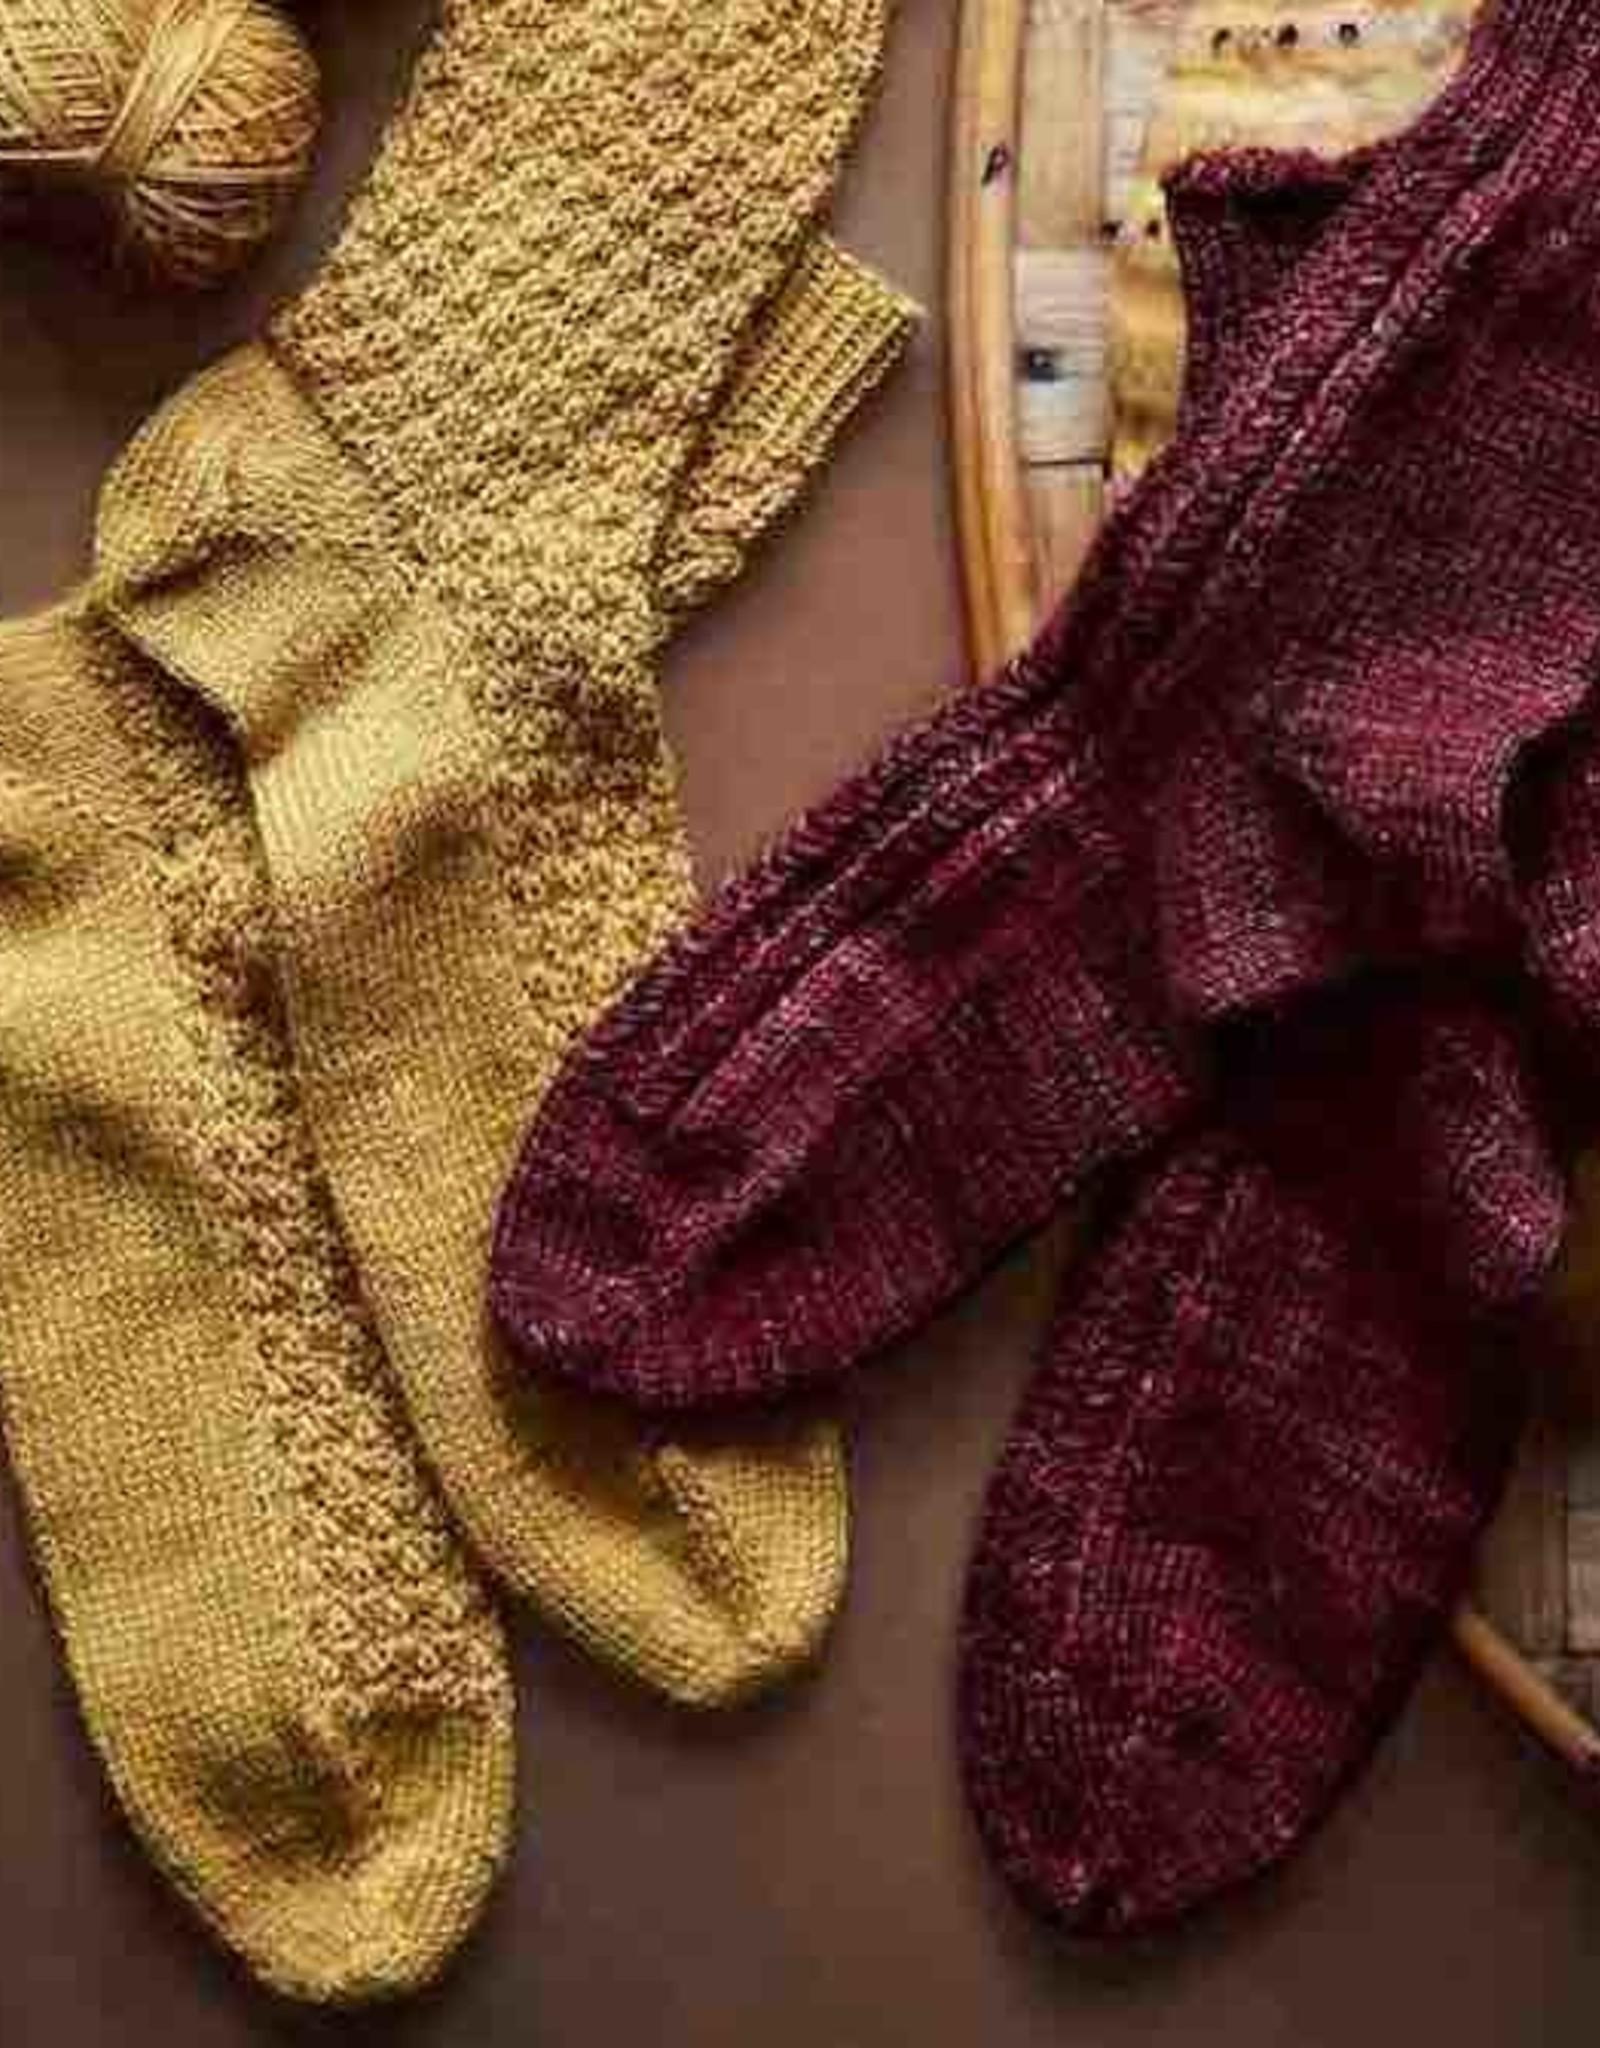 Modern Daily Knitting Modern Daily Field Guide No. 11: Wanderlust